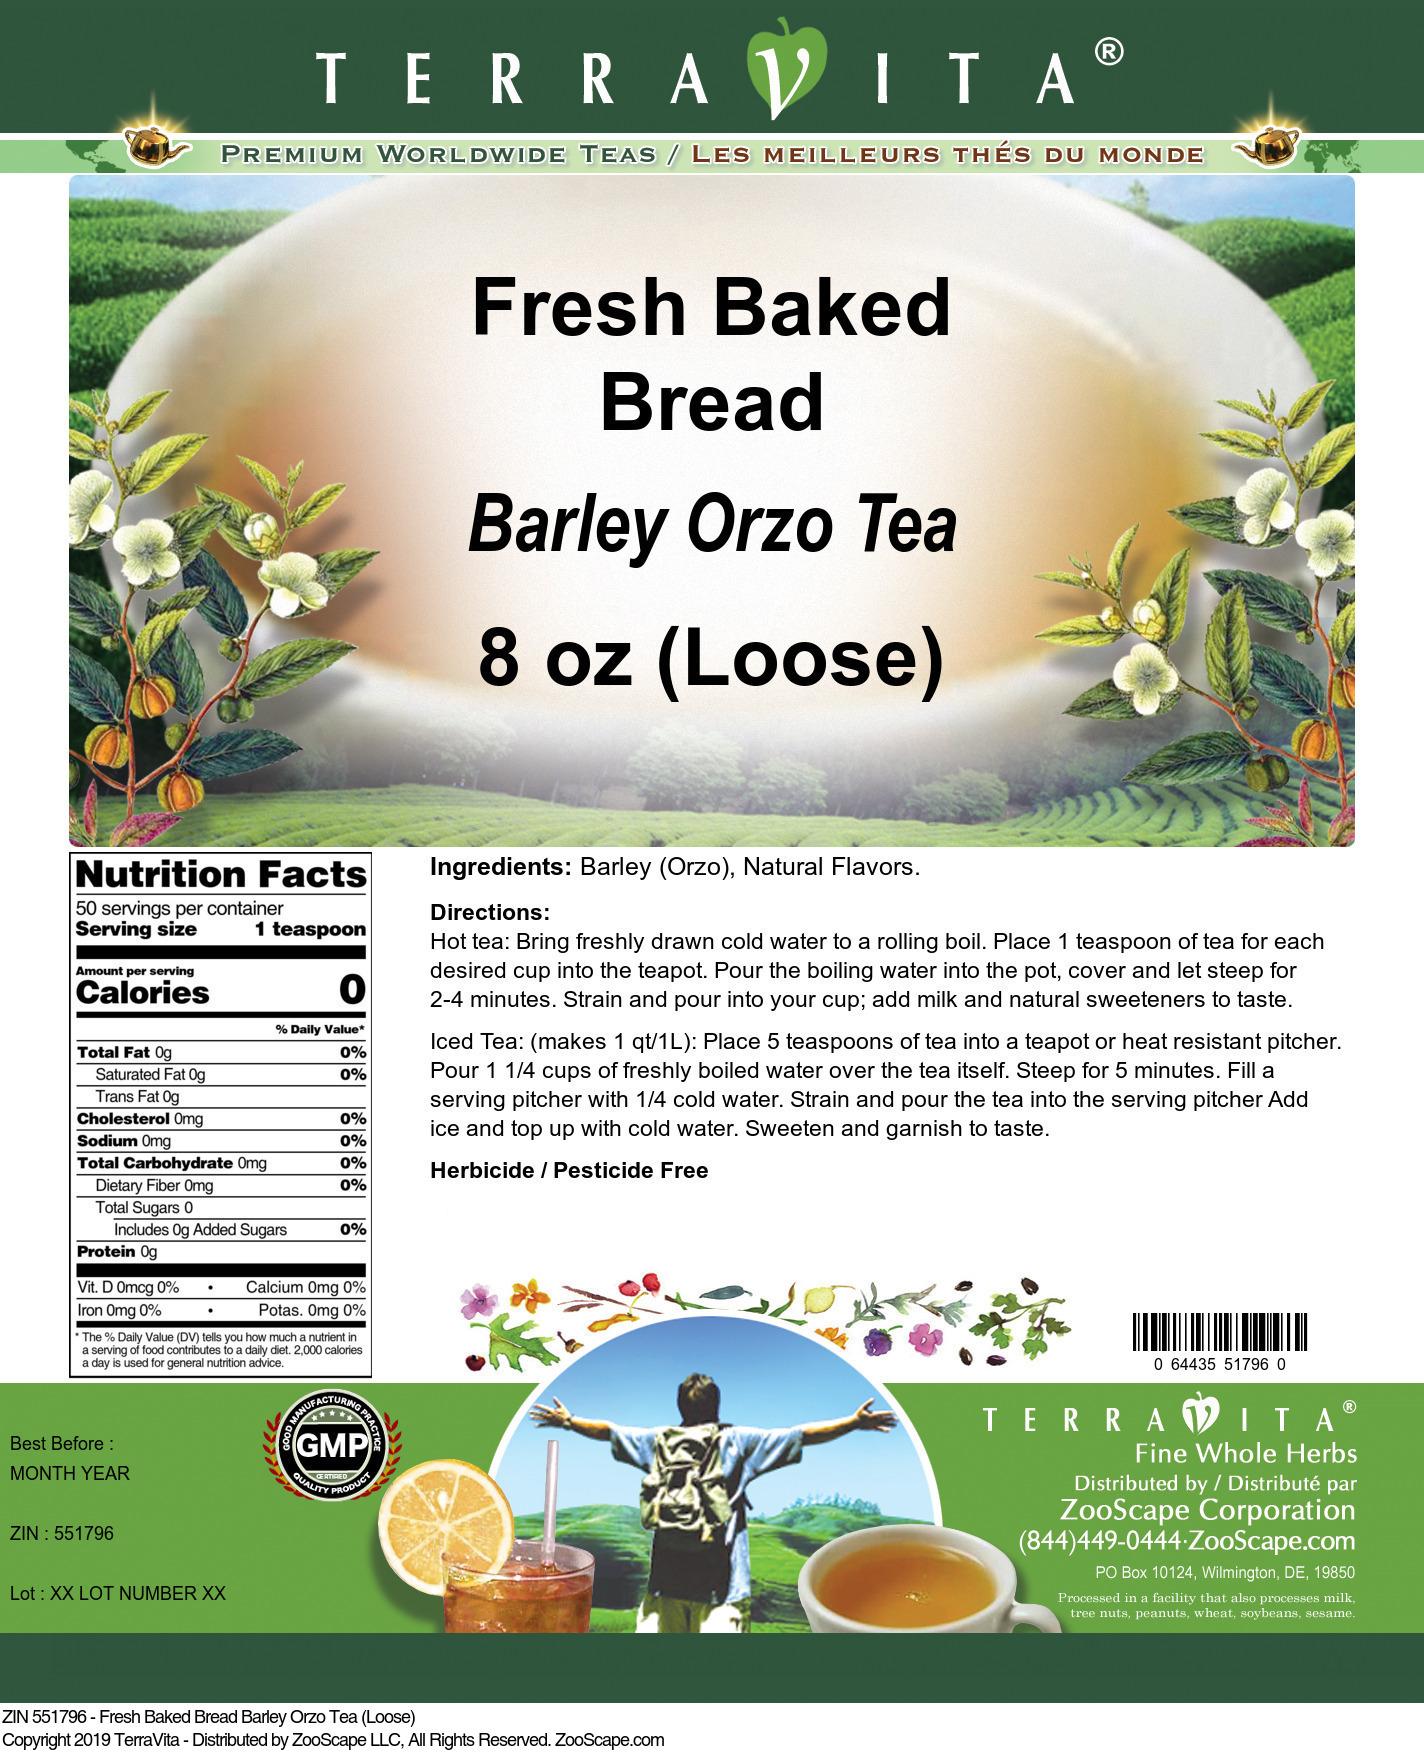 Fresh Baked Bread Barley Orzo Tea (Loose)